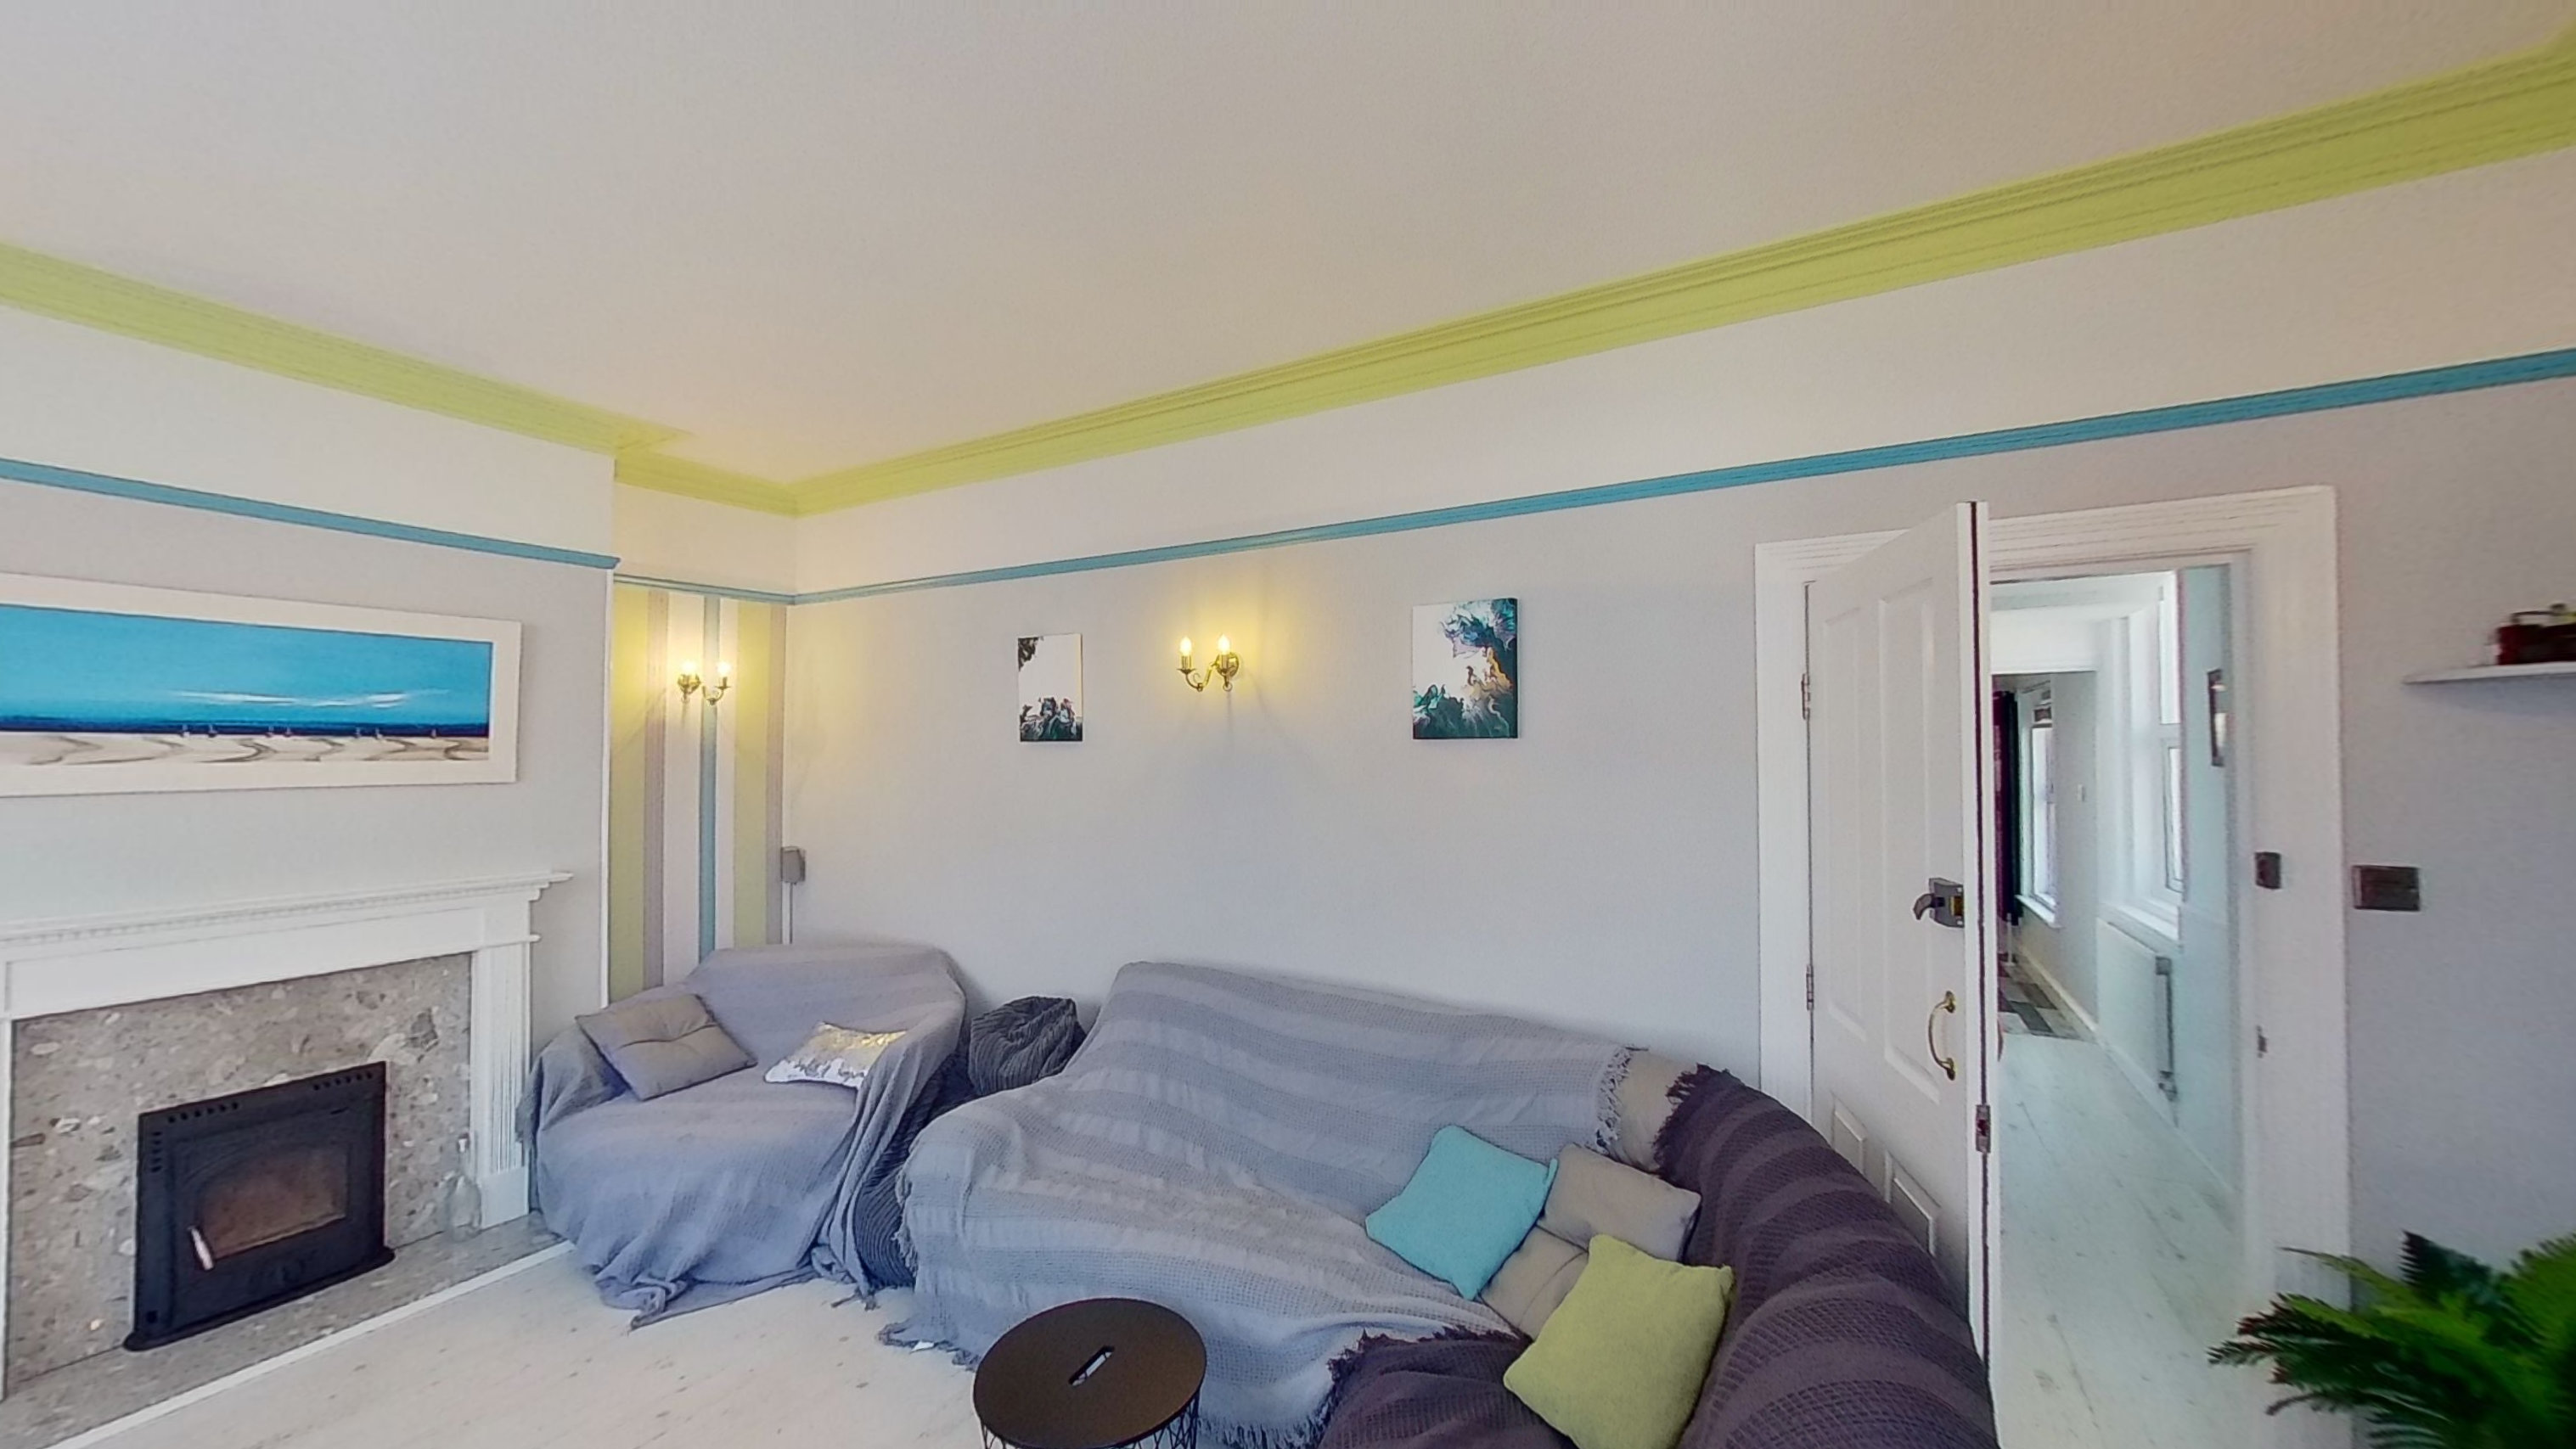 Beachcomber Holiday Lodge 07192021 051652